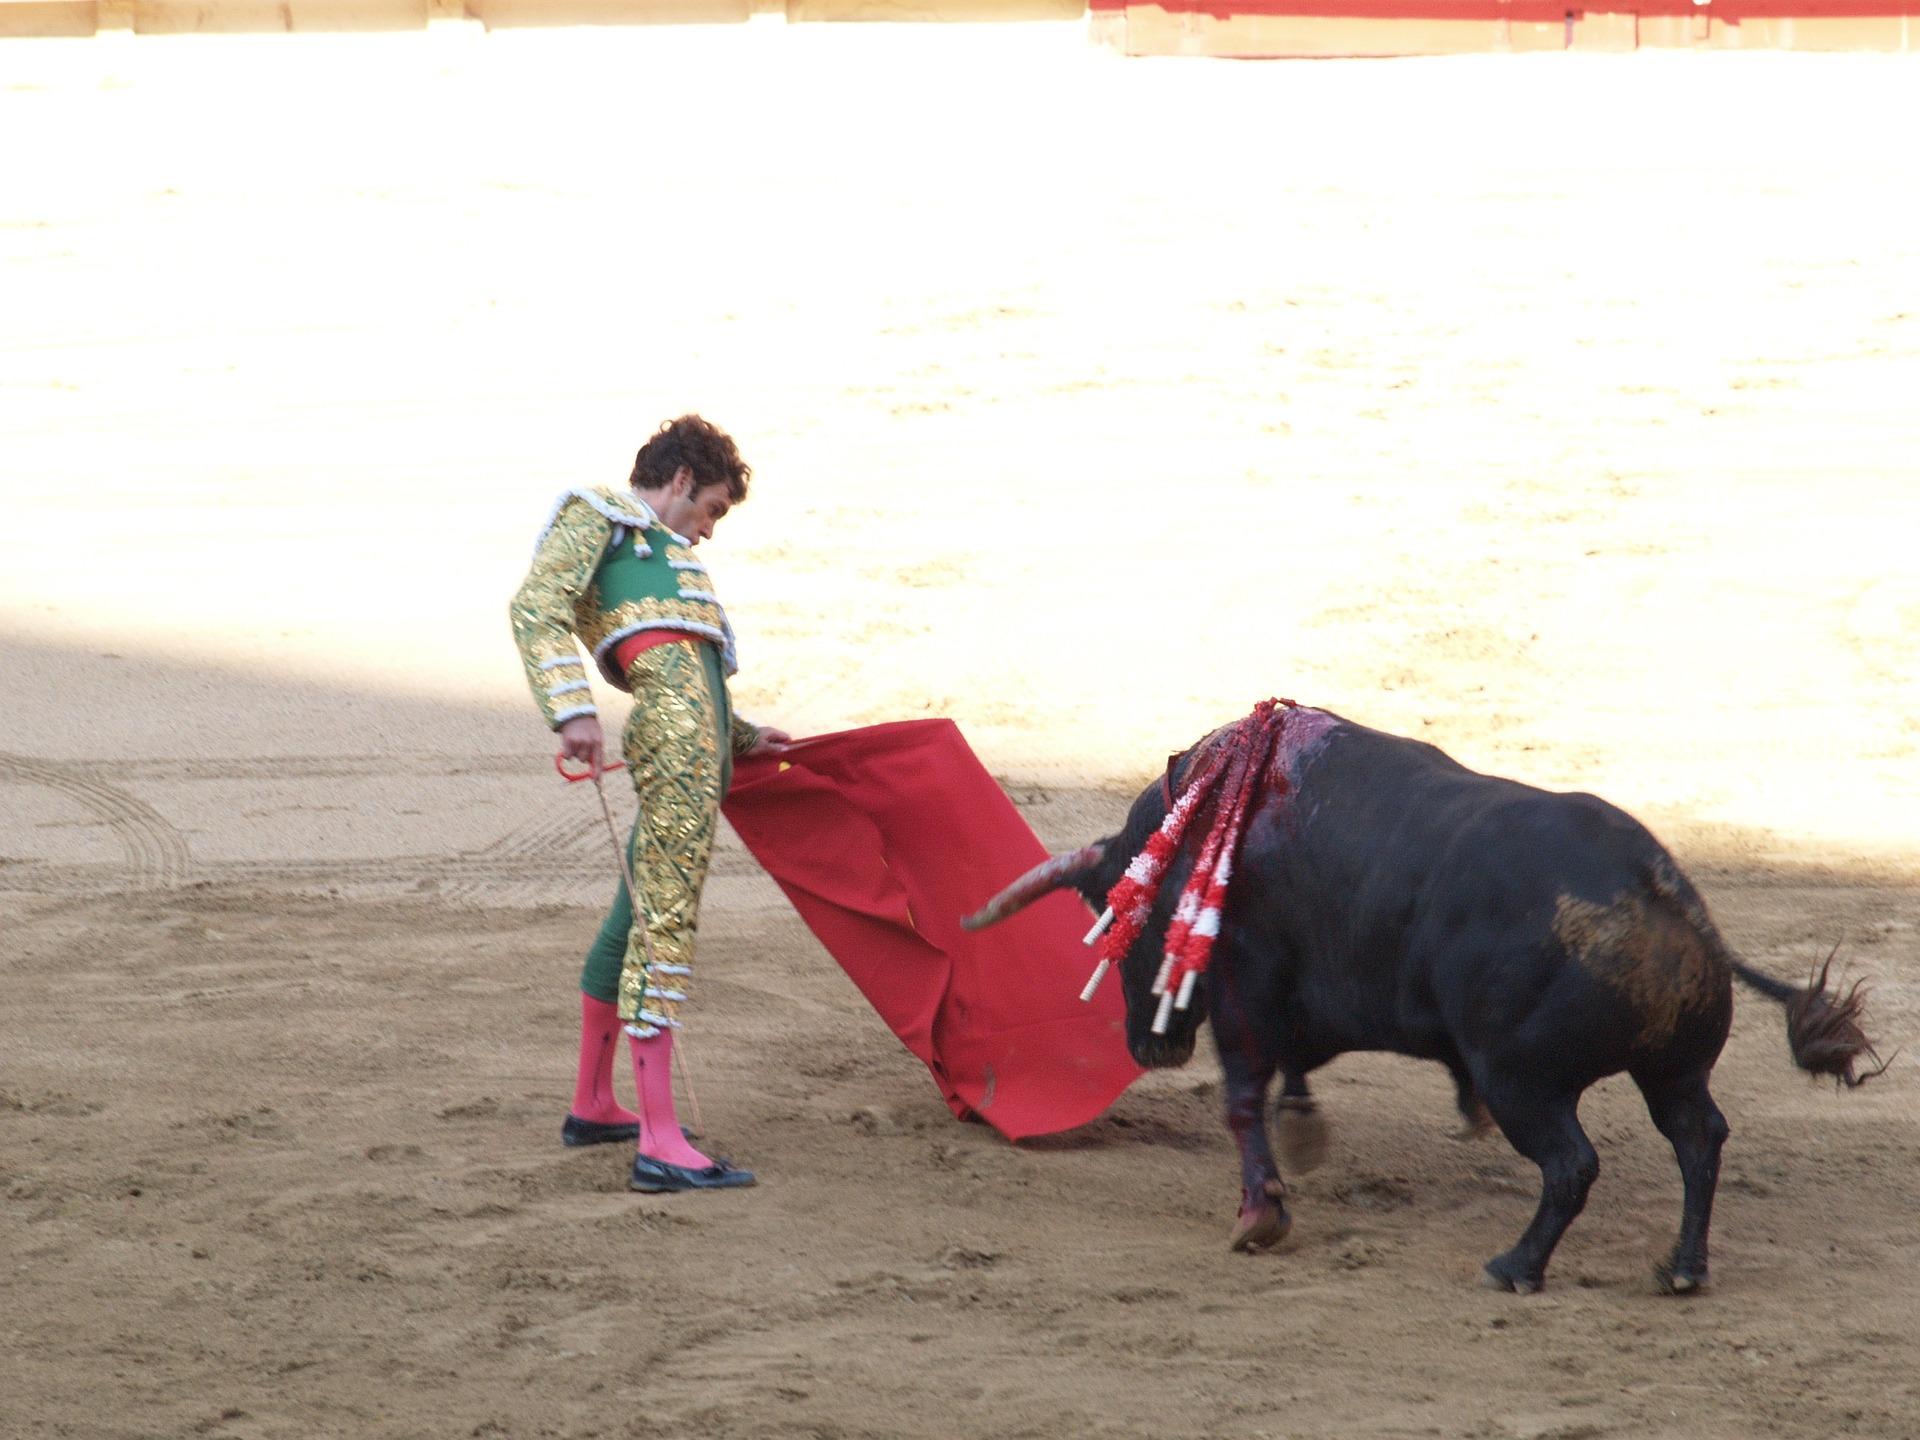 Bullfighting Injuries HD Wallpaper Background